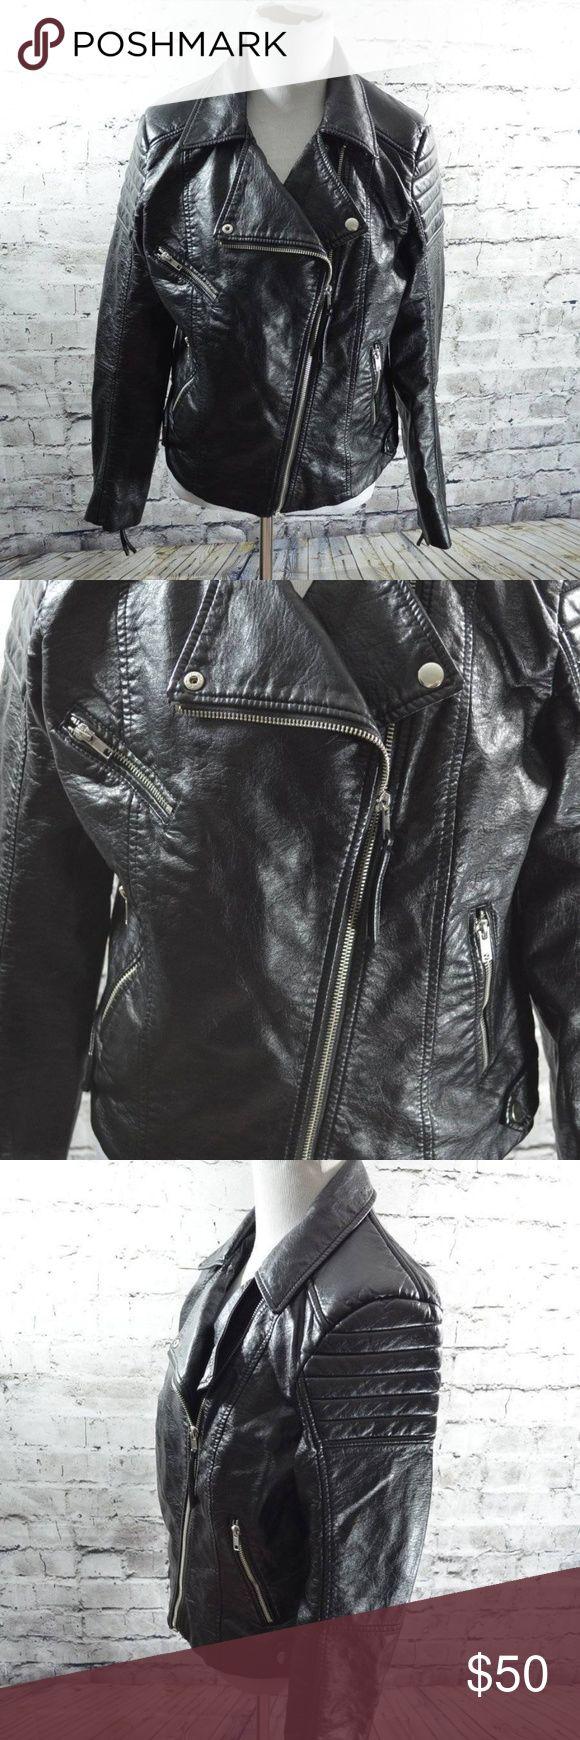 H&M Black Vegan Leather Moto Biker Jacket 12 Moto biker